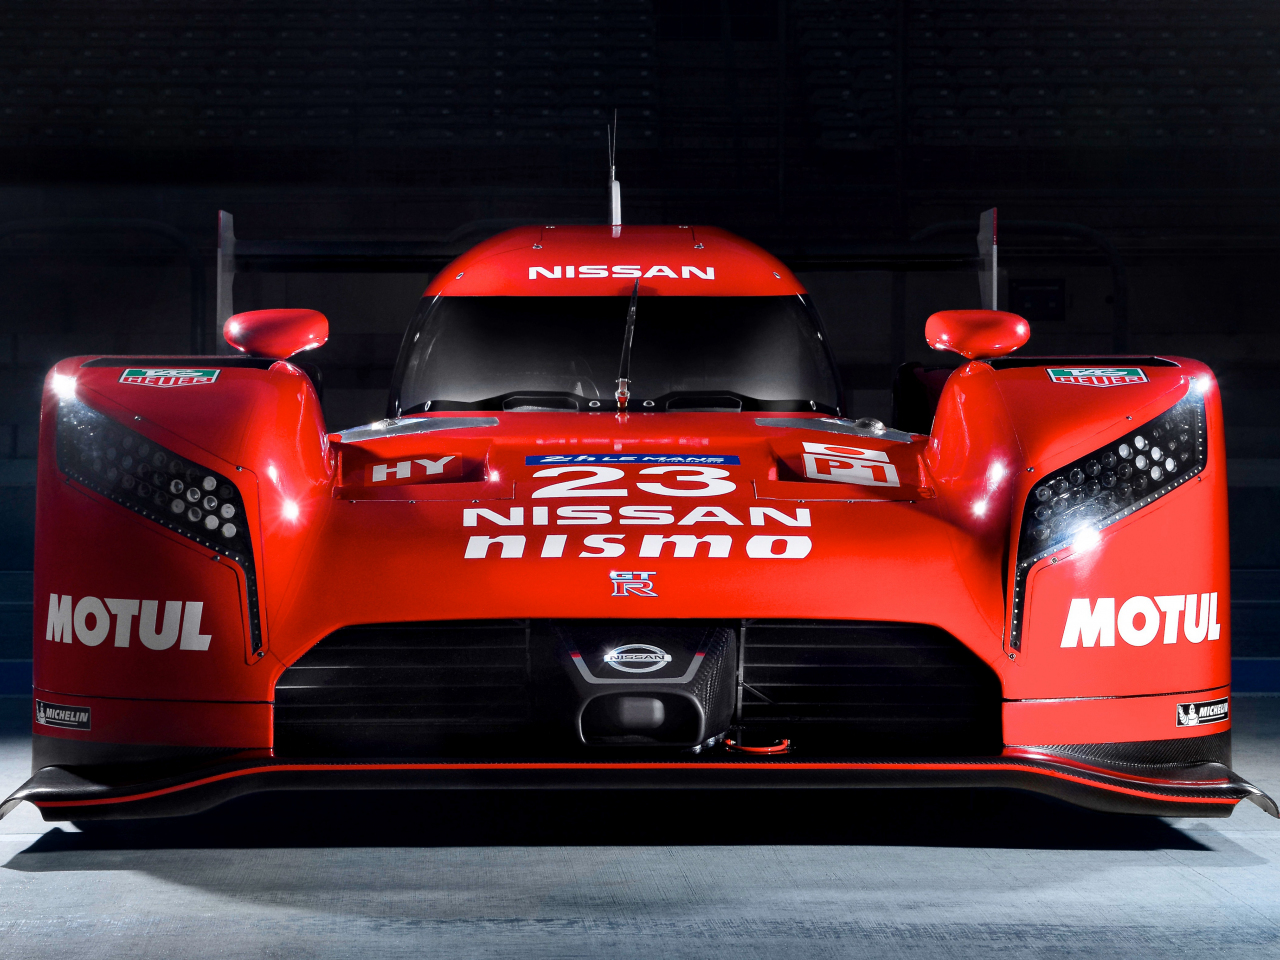 1280x960 wallpaper Nissan GT-R LM Nismo prototype racing car